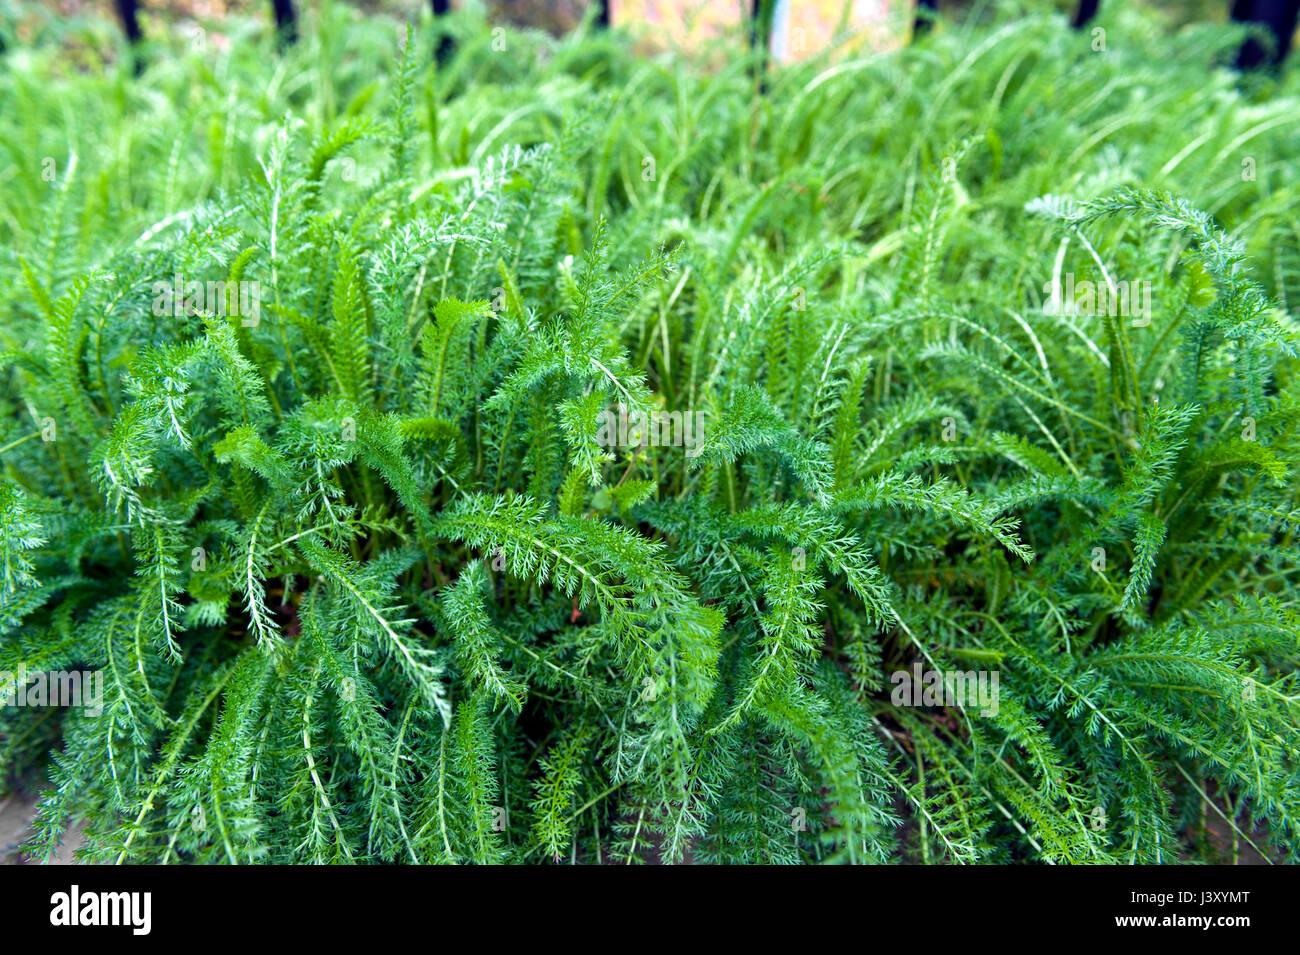 Lush leaves of Common Yarrow (Achillea millefolium) grow in herbal garden - Stock Image